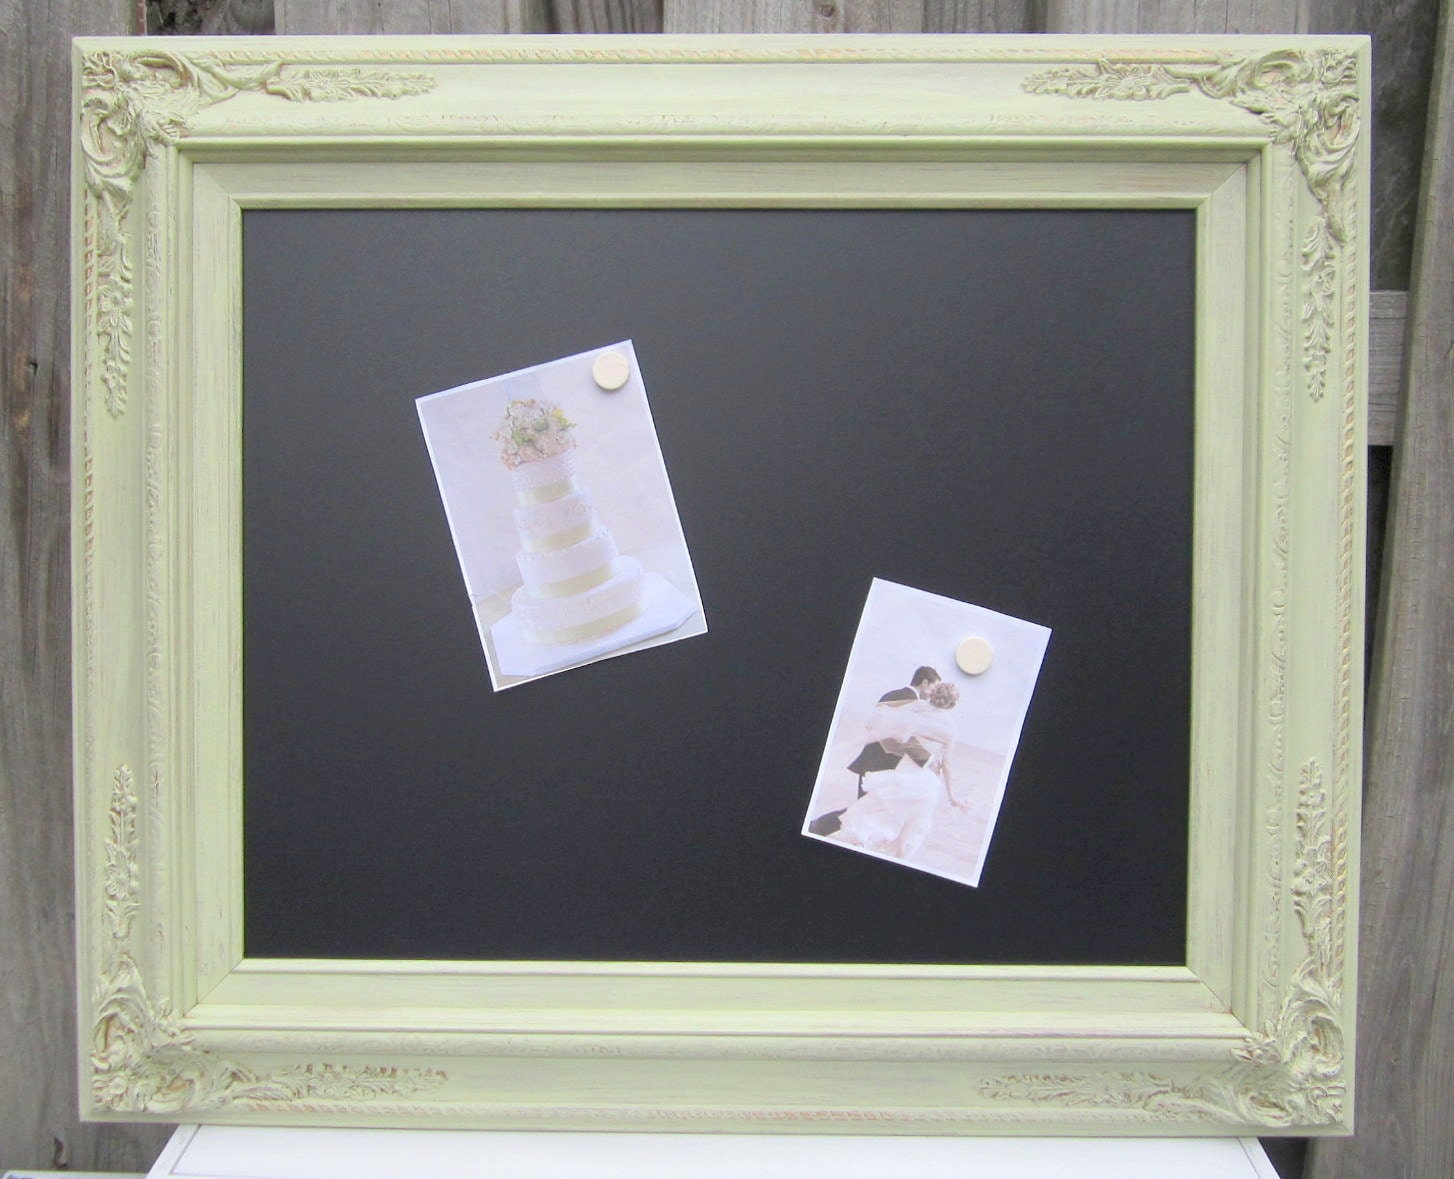 Ornate framed chalkboard for sale 27x23 celery for Framed photos for sale